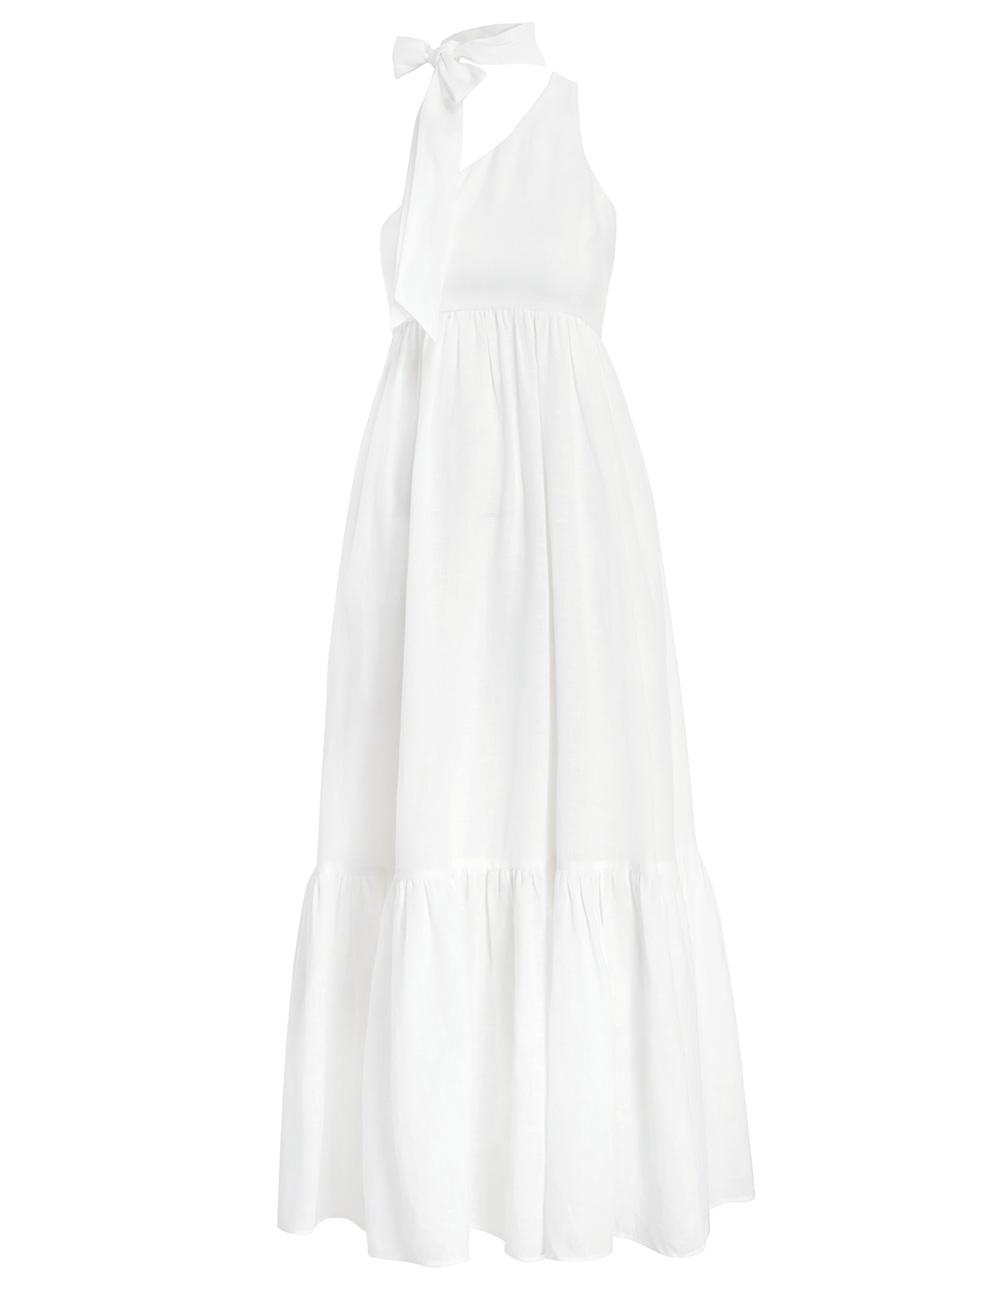 Juliette Tie Neck Dress